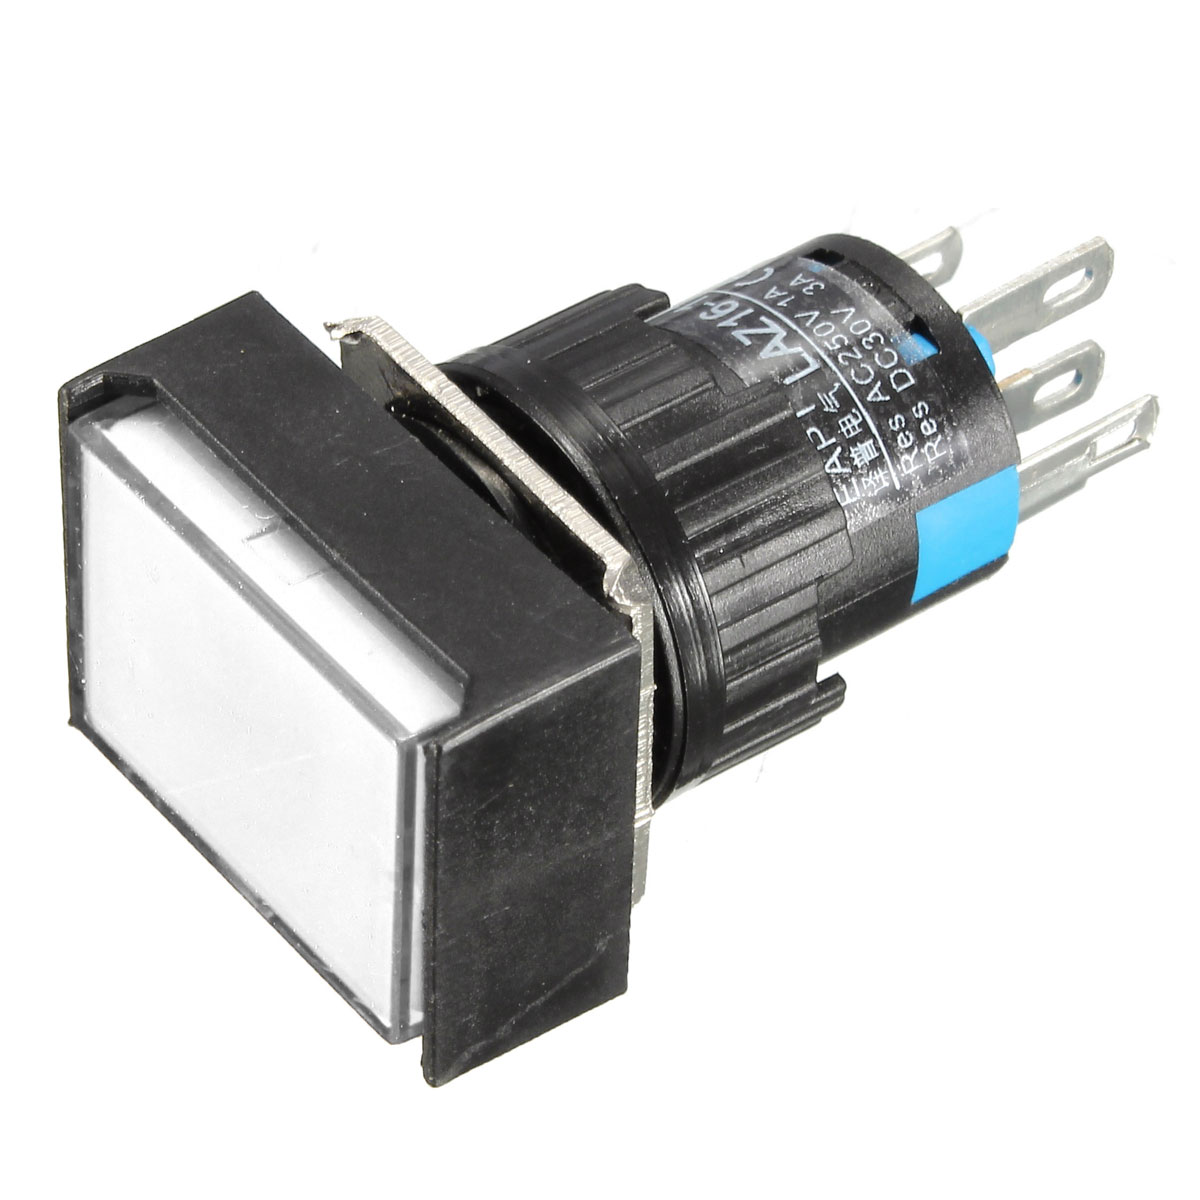 New-LED-Light-Push-Button-Switch-Rectangular-DC-12V-24V-Momentary-Latching-24mm